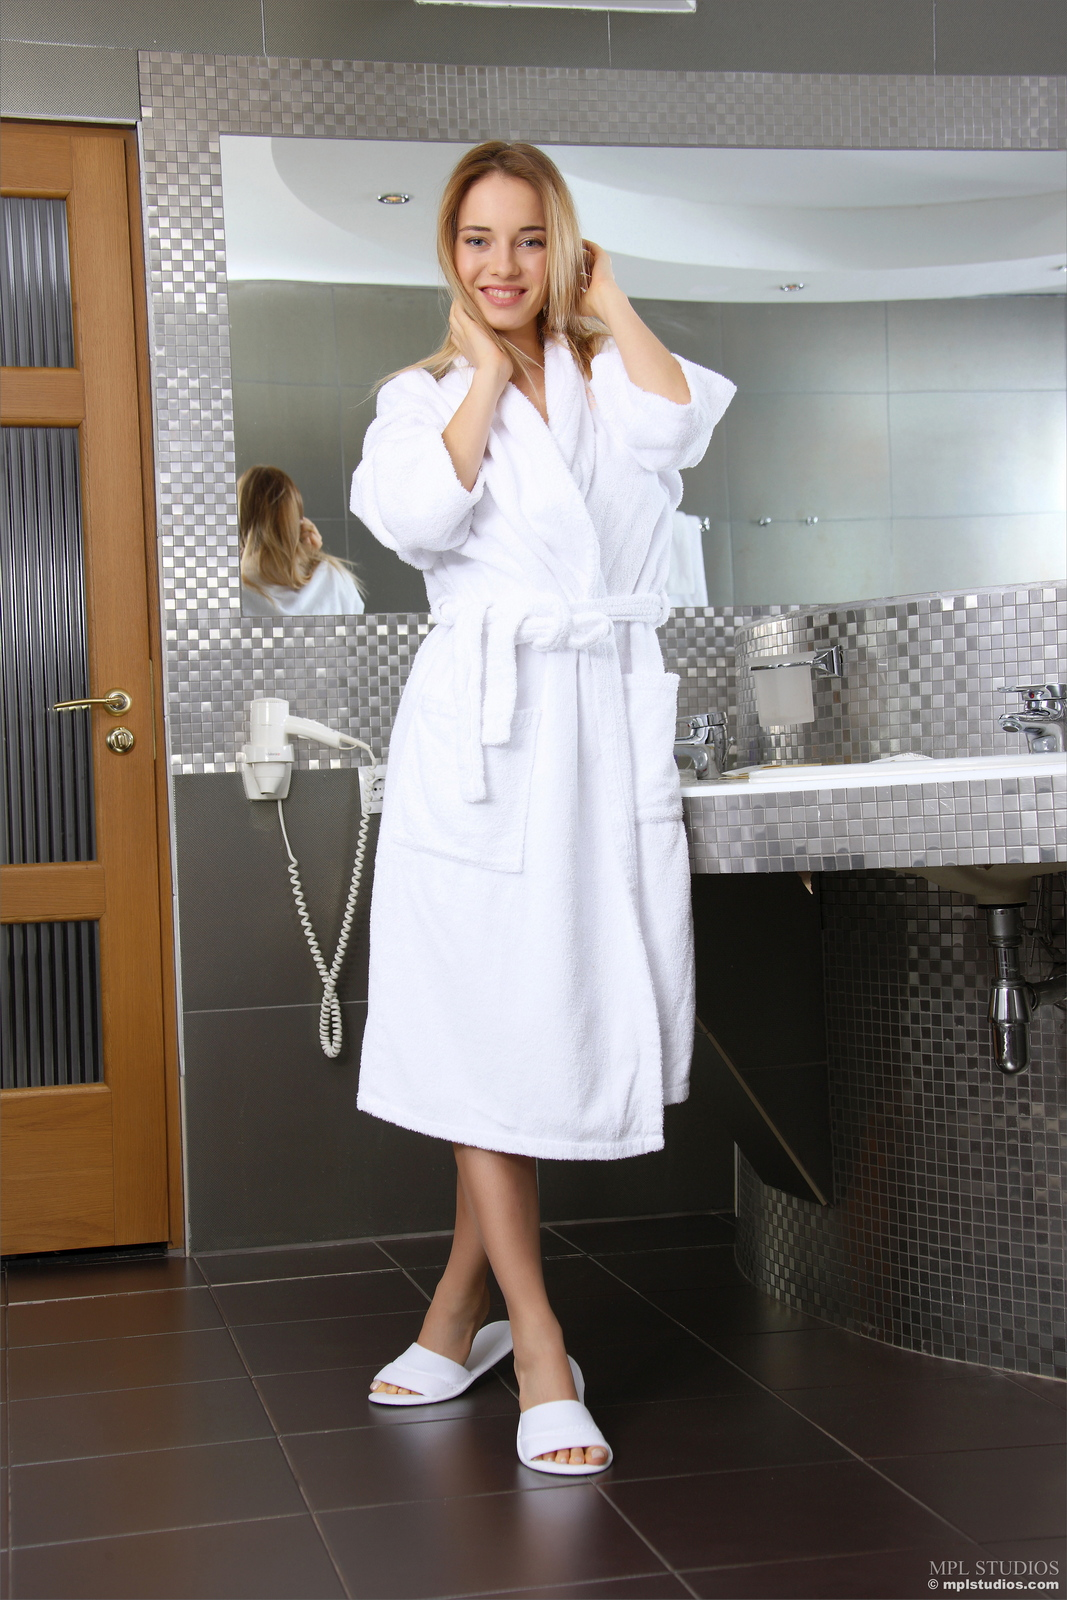 danica-bathroom-blonde-dressing-gown-naked-mplstudios-01